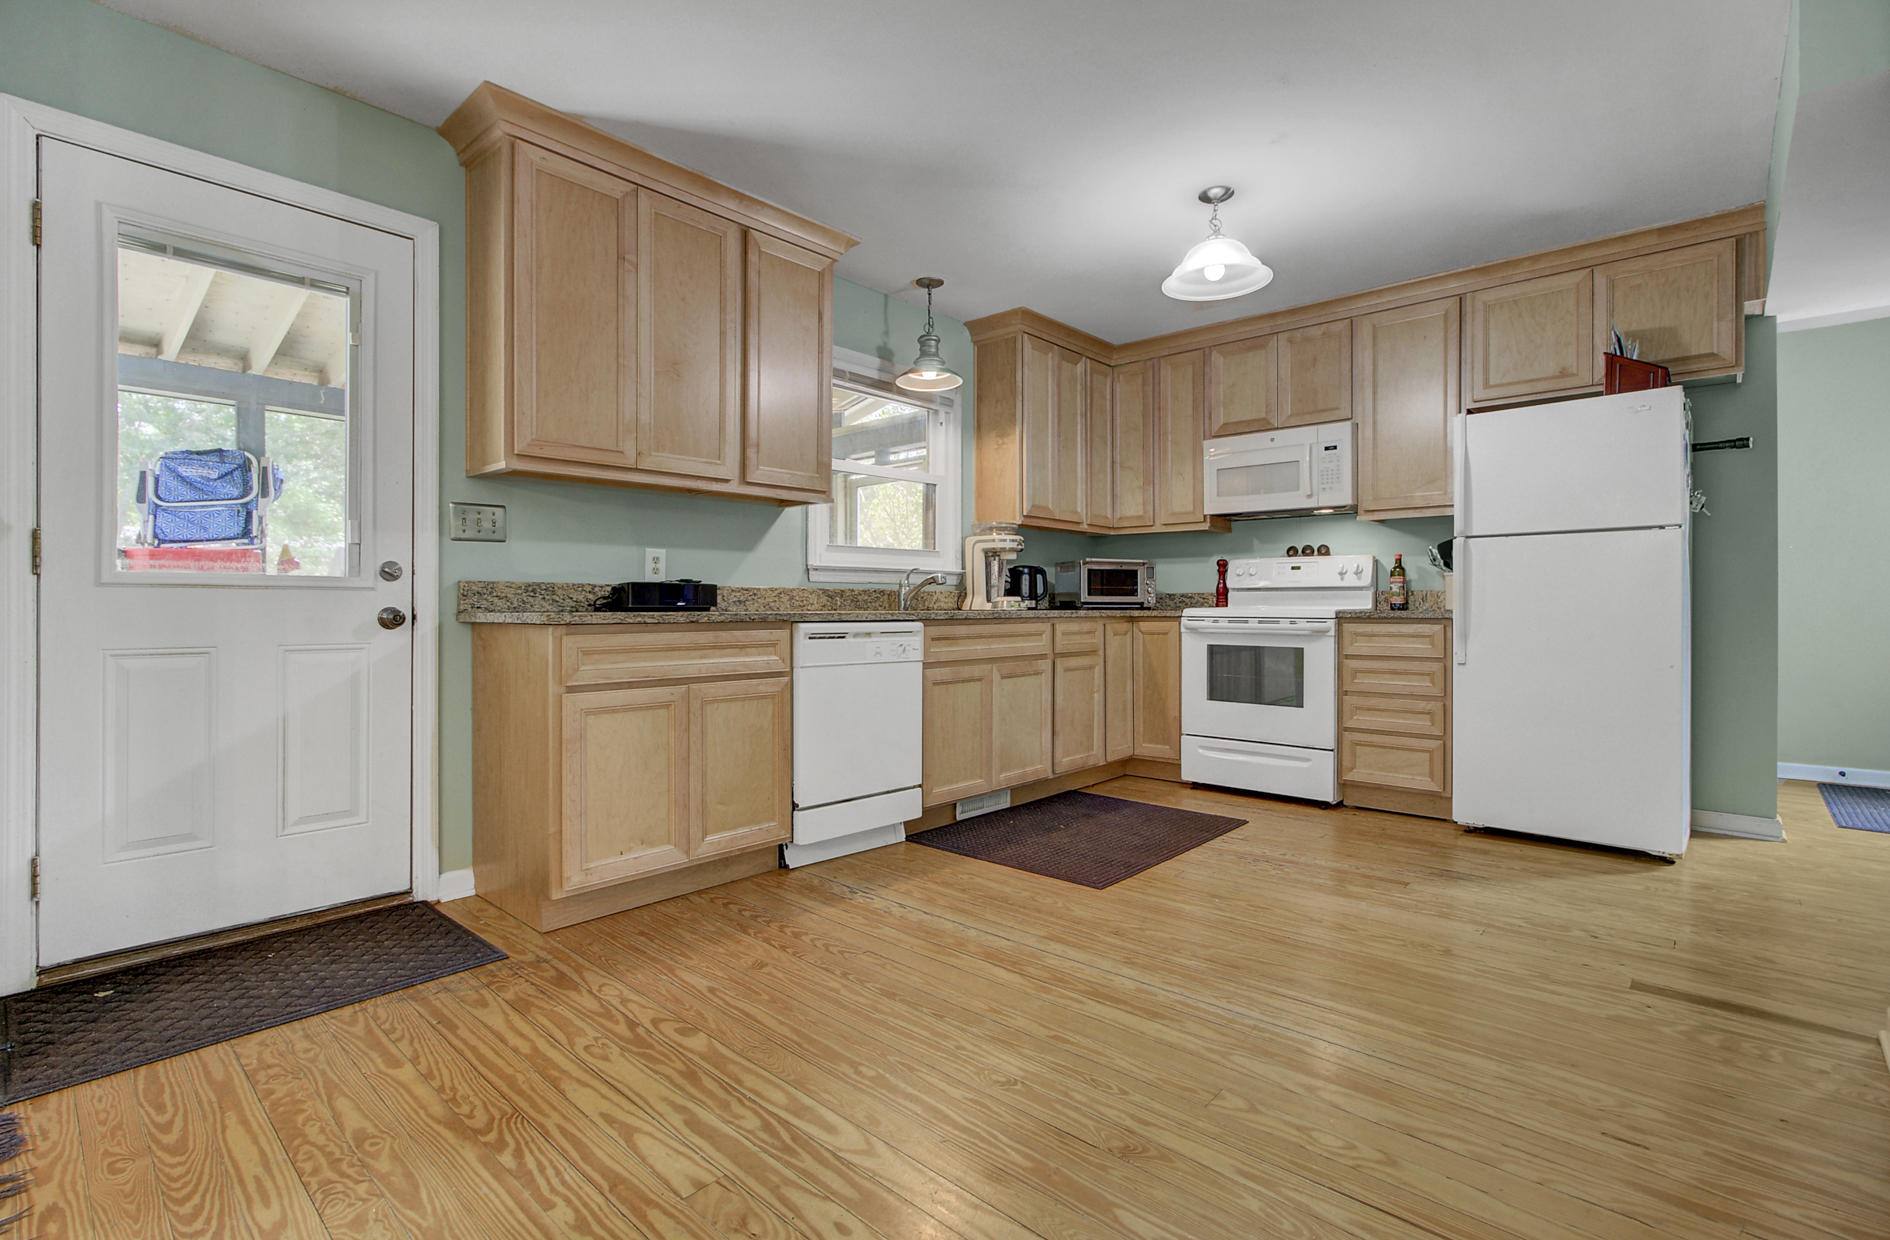 Yaugh Hall Homes For Sale - 1229 Porchers Bluff, Mount Pleasant, SC - 17